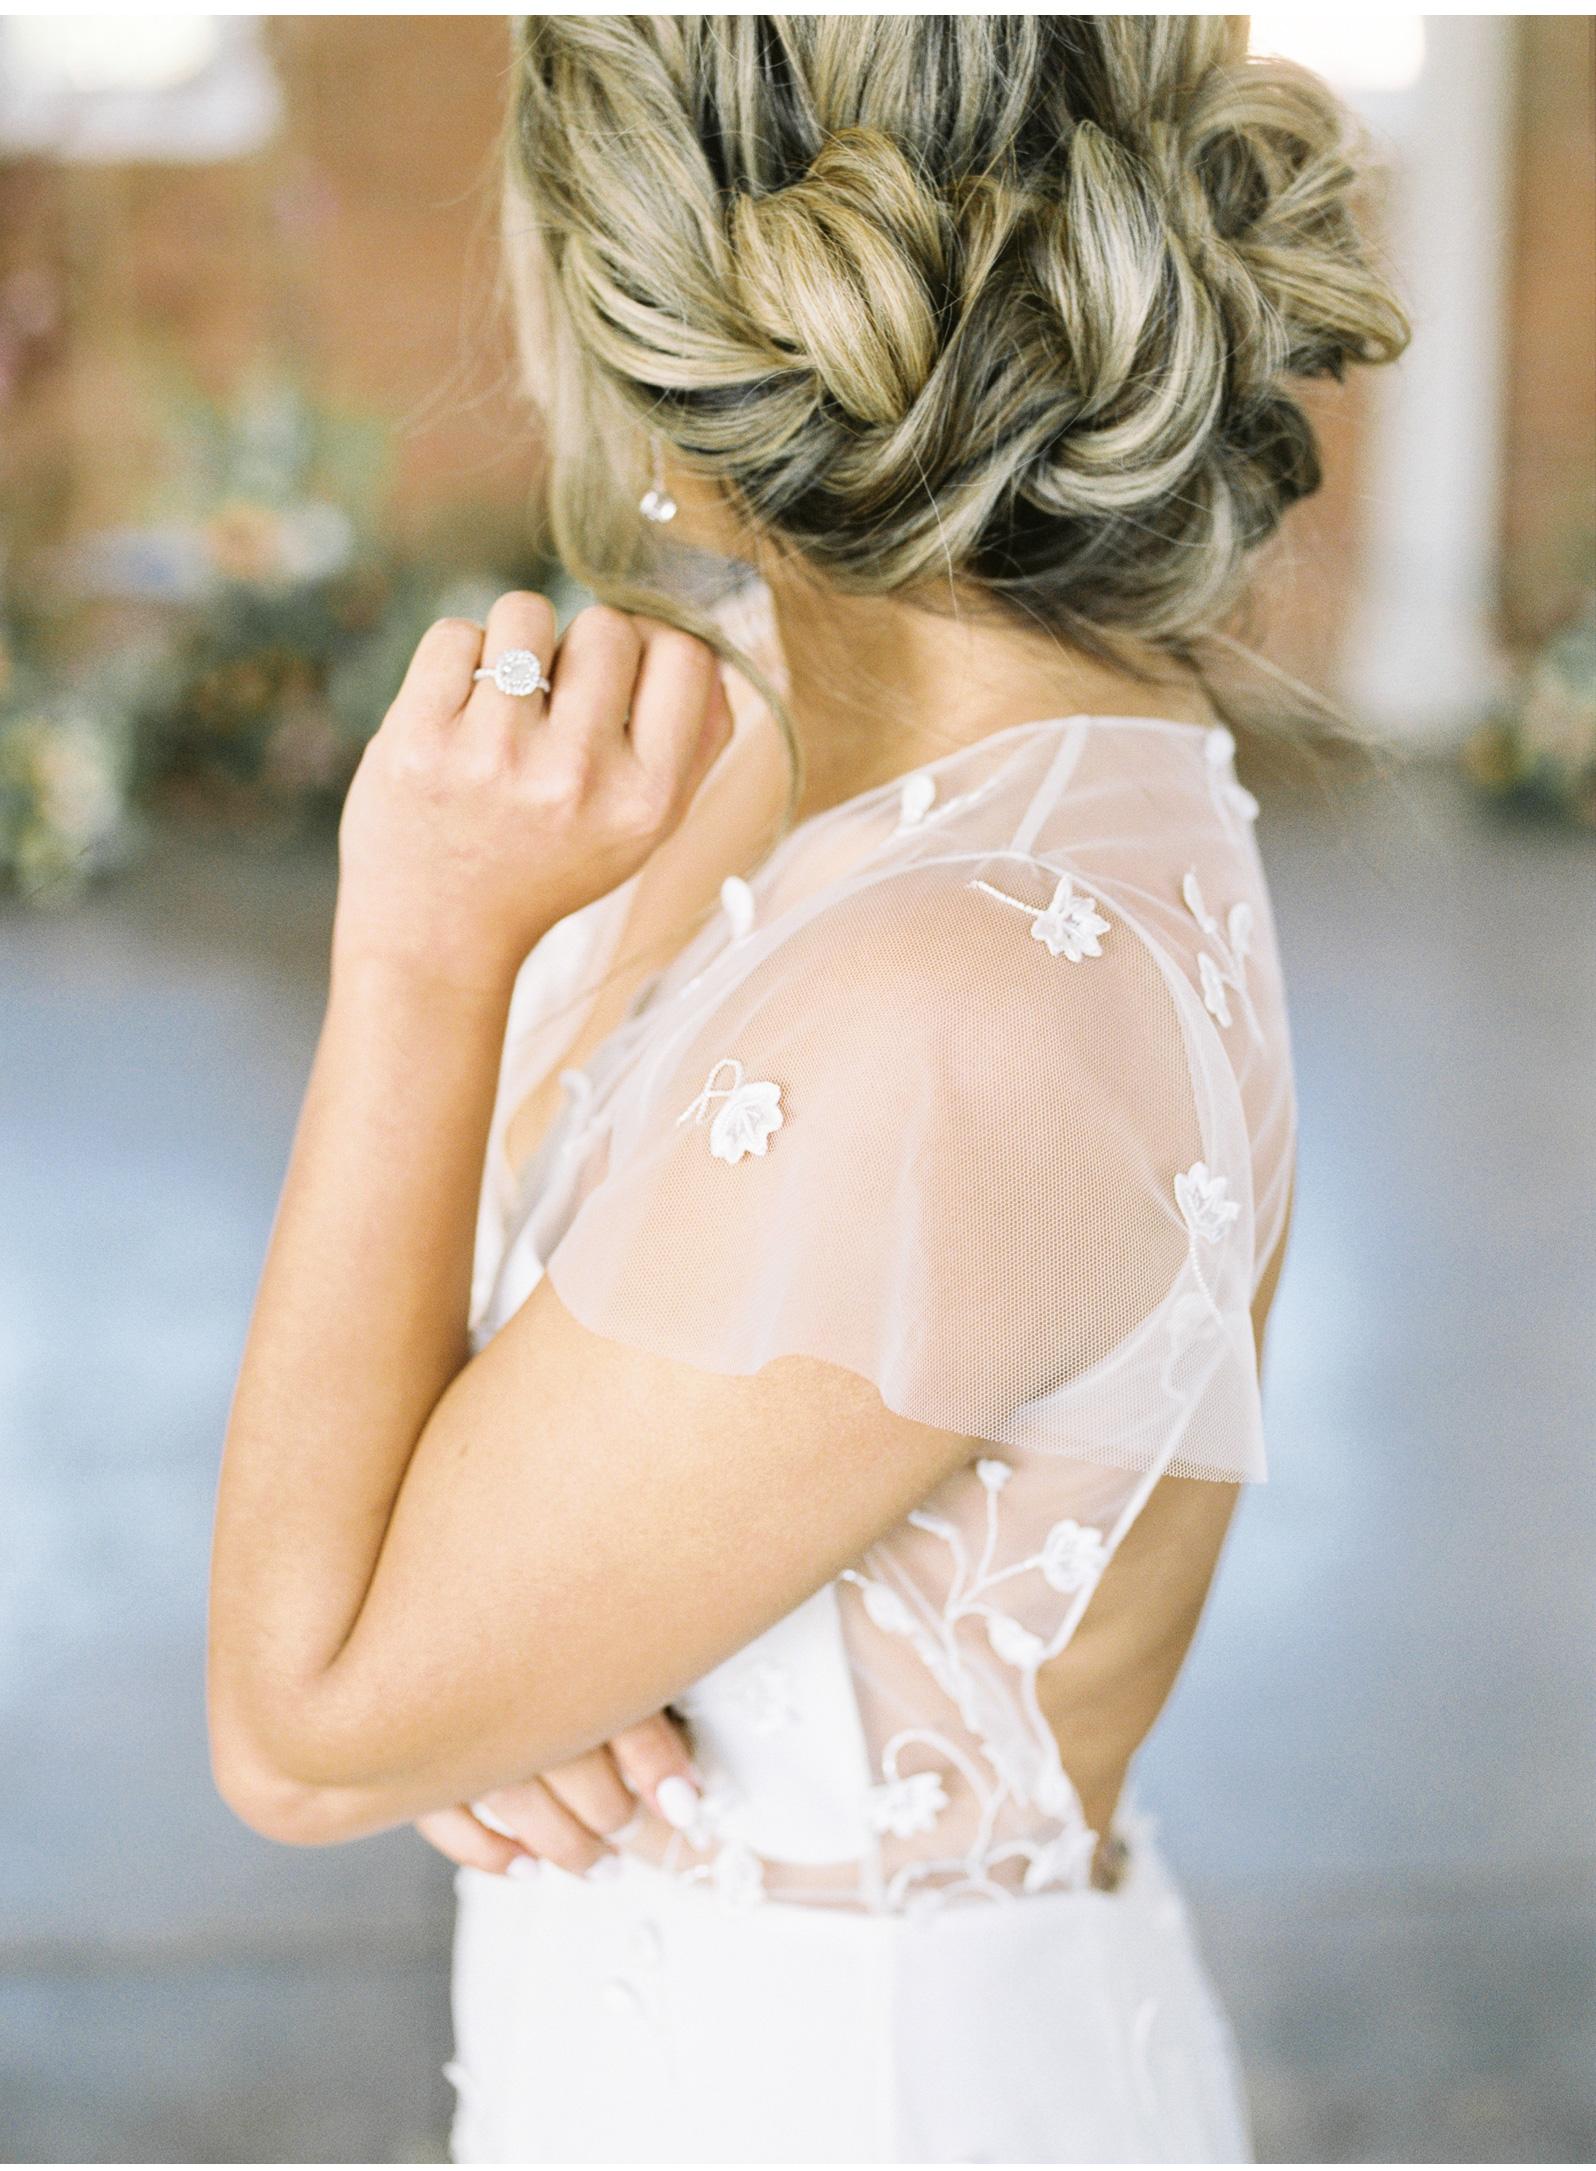 Malibu-Wedding-Photographer-Natalie-Schutt-Photography-Inspired-by-This_17.jpg